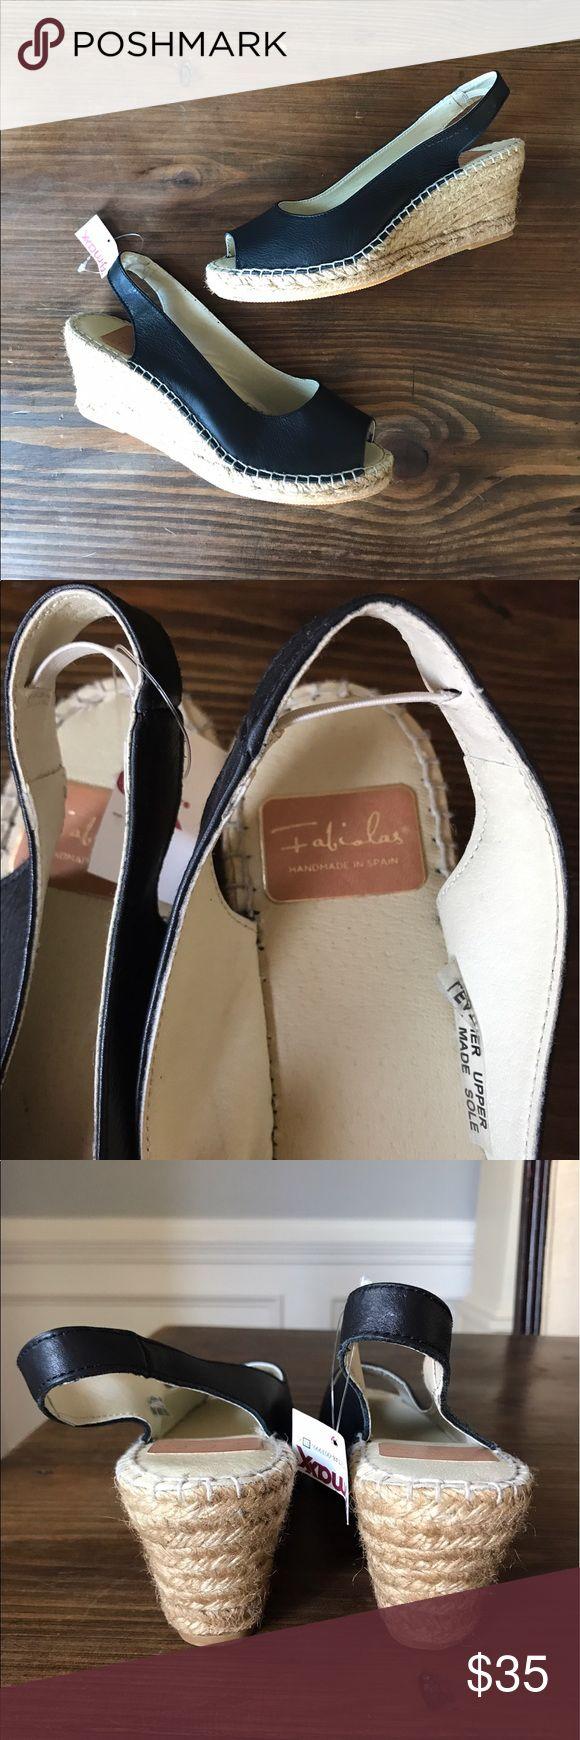 Fabiola's Black Peep Toe Wedge size 9 Super cute and flirty, Black Peep Toe Wedge shoe. Brand new Fabiolas - handmade in Spain Size 9! fabiolas Shoes Wedges